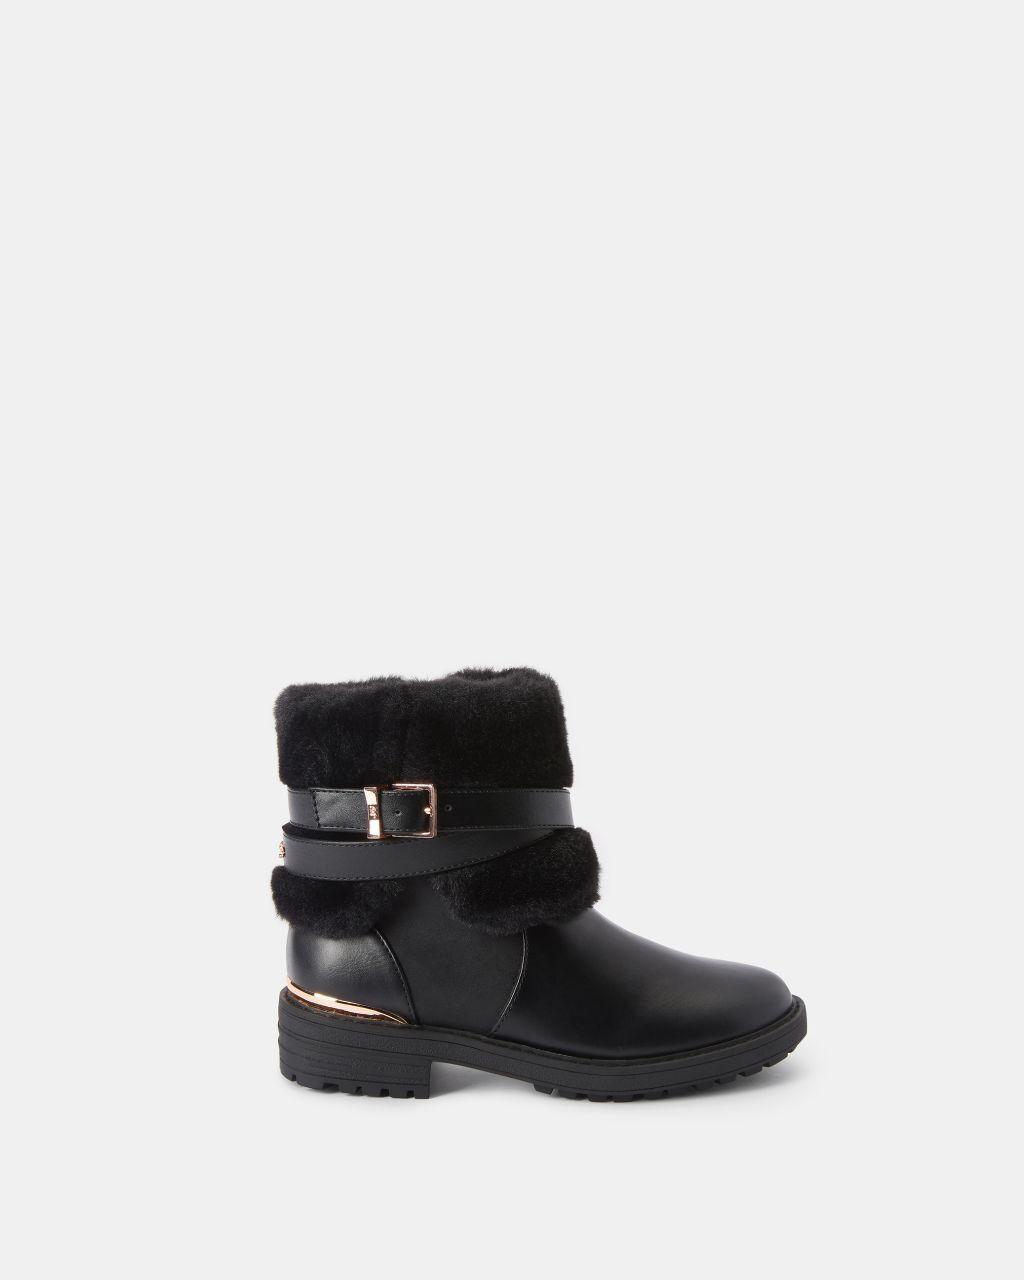 Ted Baker Faux Fur Trim Buckle Boots  - Black - Size: 11 OLDER